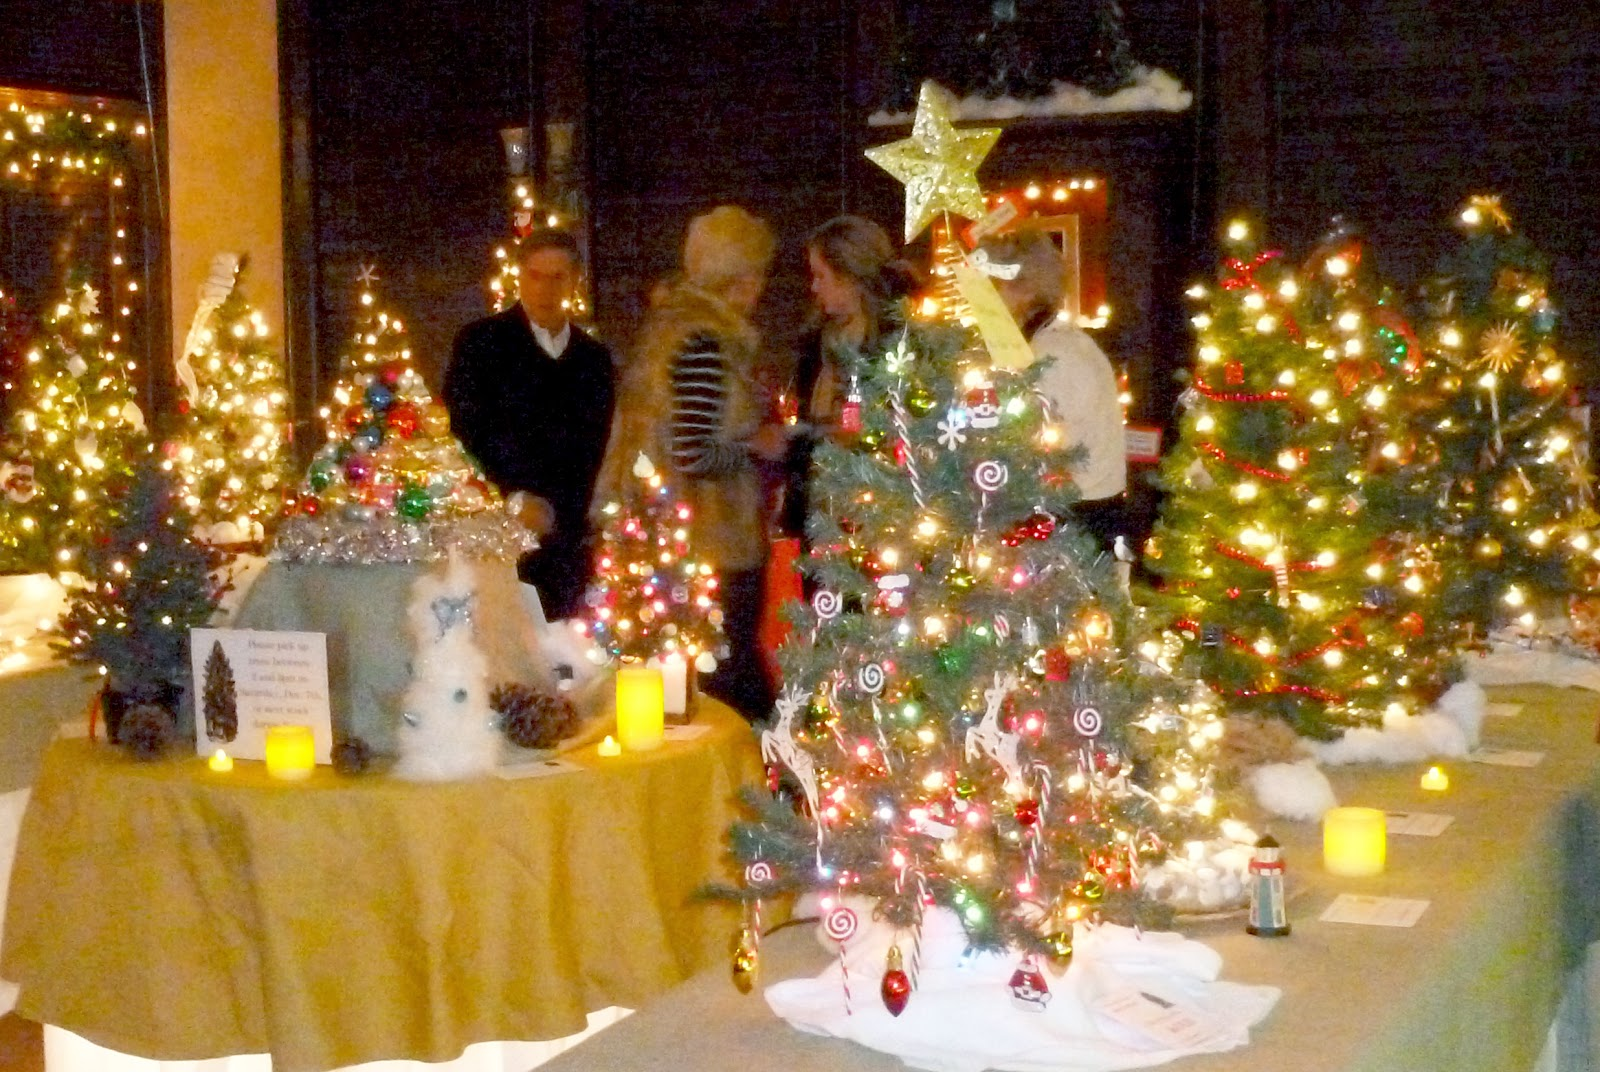 743 tags christmas decorations festival holiday christmas tree views - Washington S Festival Of Trees Lights